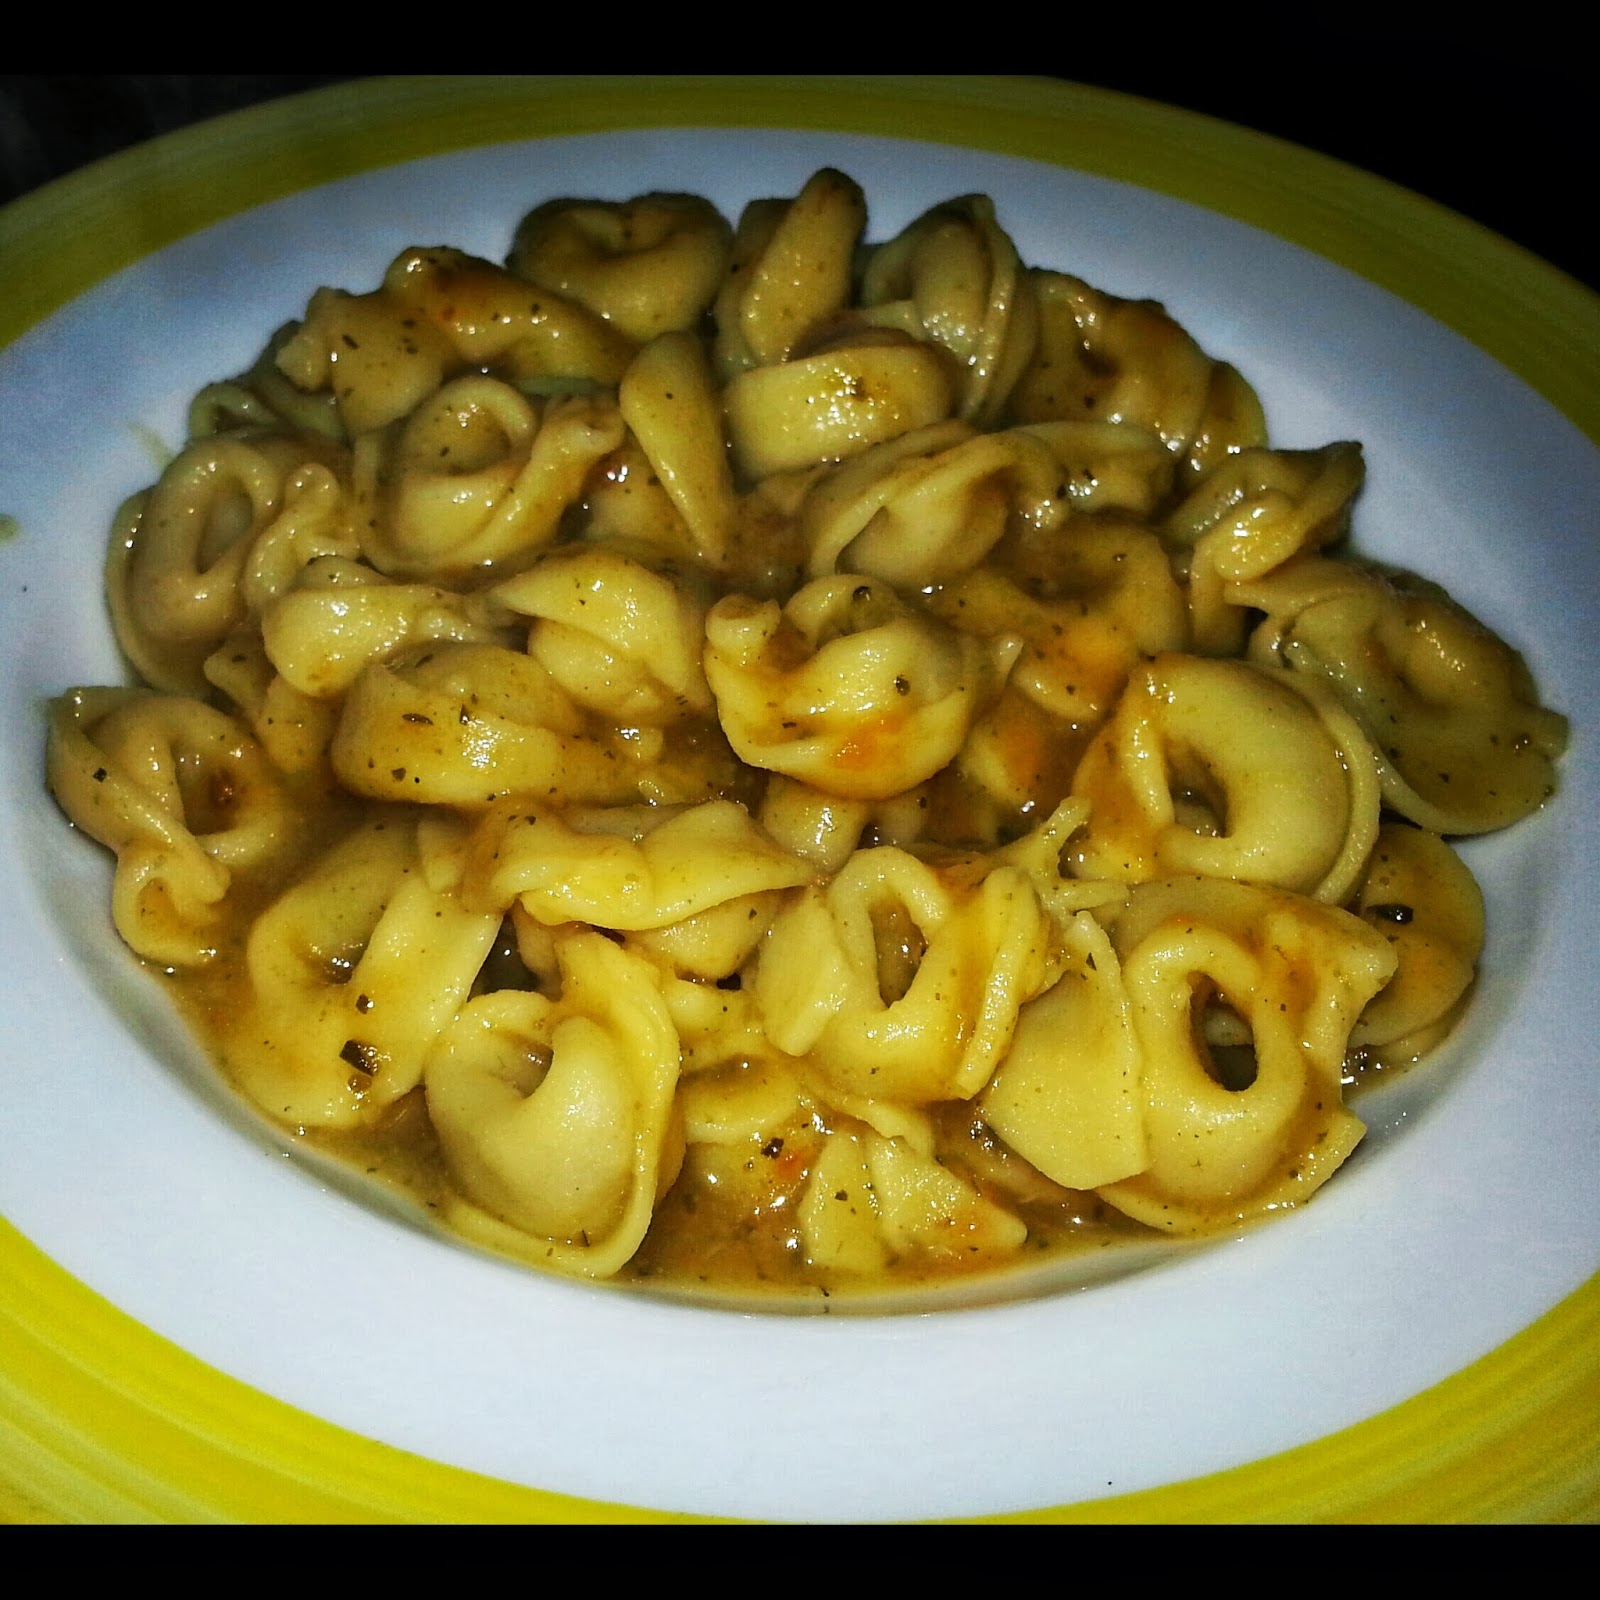 Ricette di cucina per 6 persone  Ricette casalinghe popolari